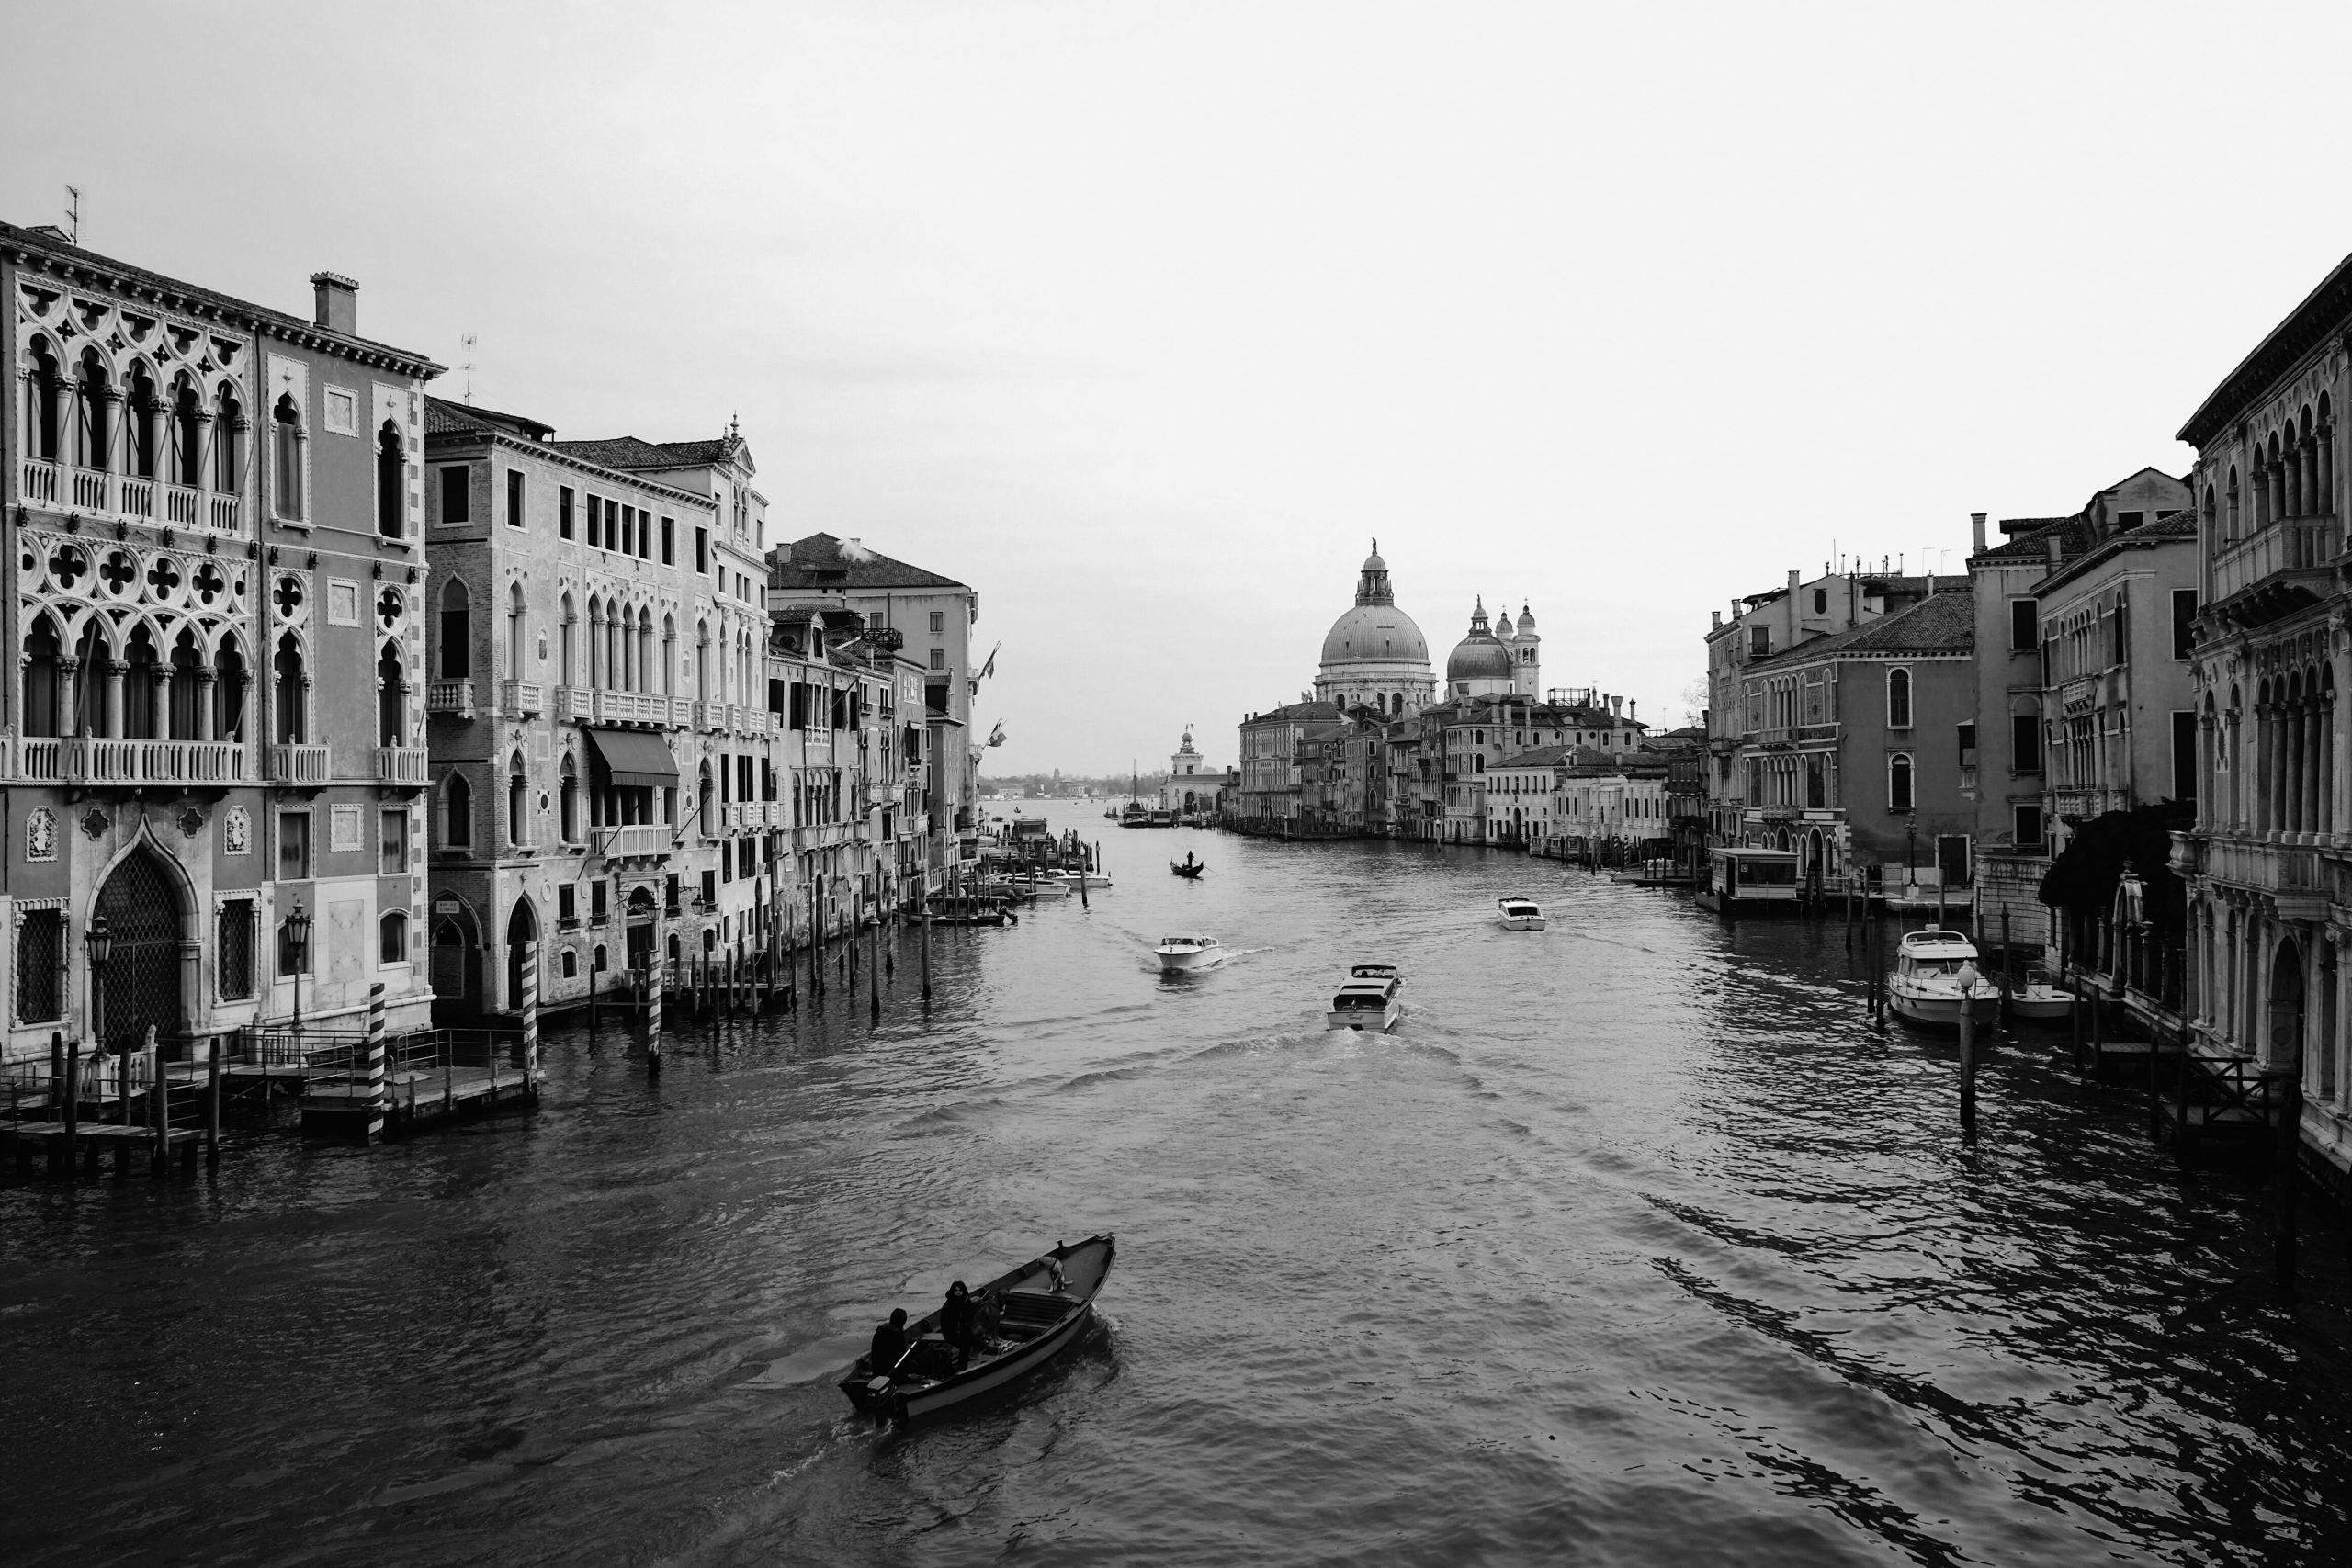 Venetië in Amersfoort -Da Luca - Stijn te Strake via Unsplash